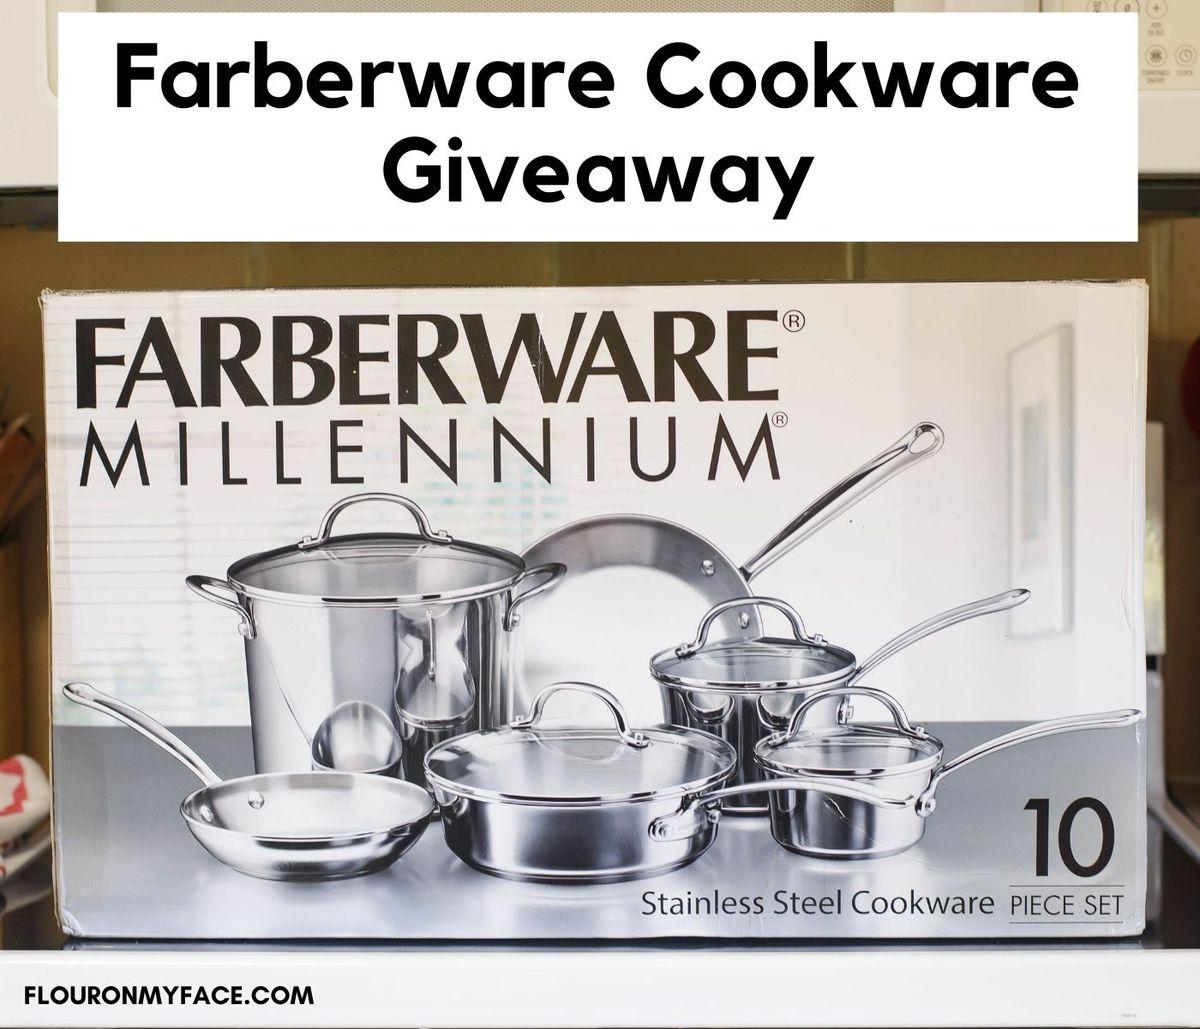 Unopened box of the Farberware 10 piece Photo of the Farberware 10 piece Millennium stainless steel cookware set.